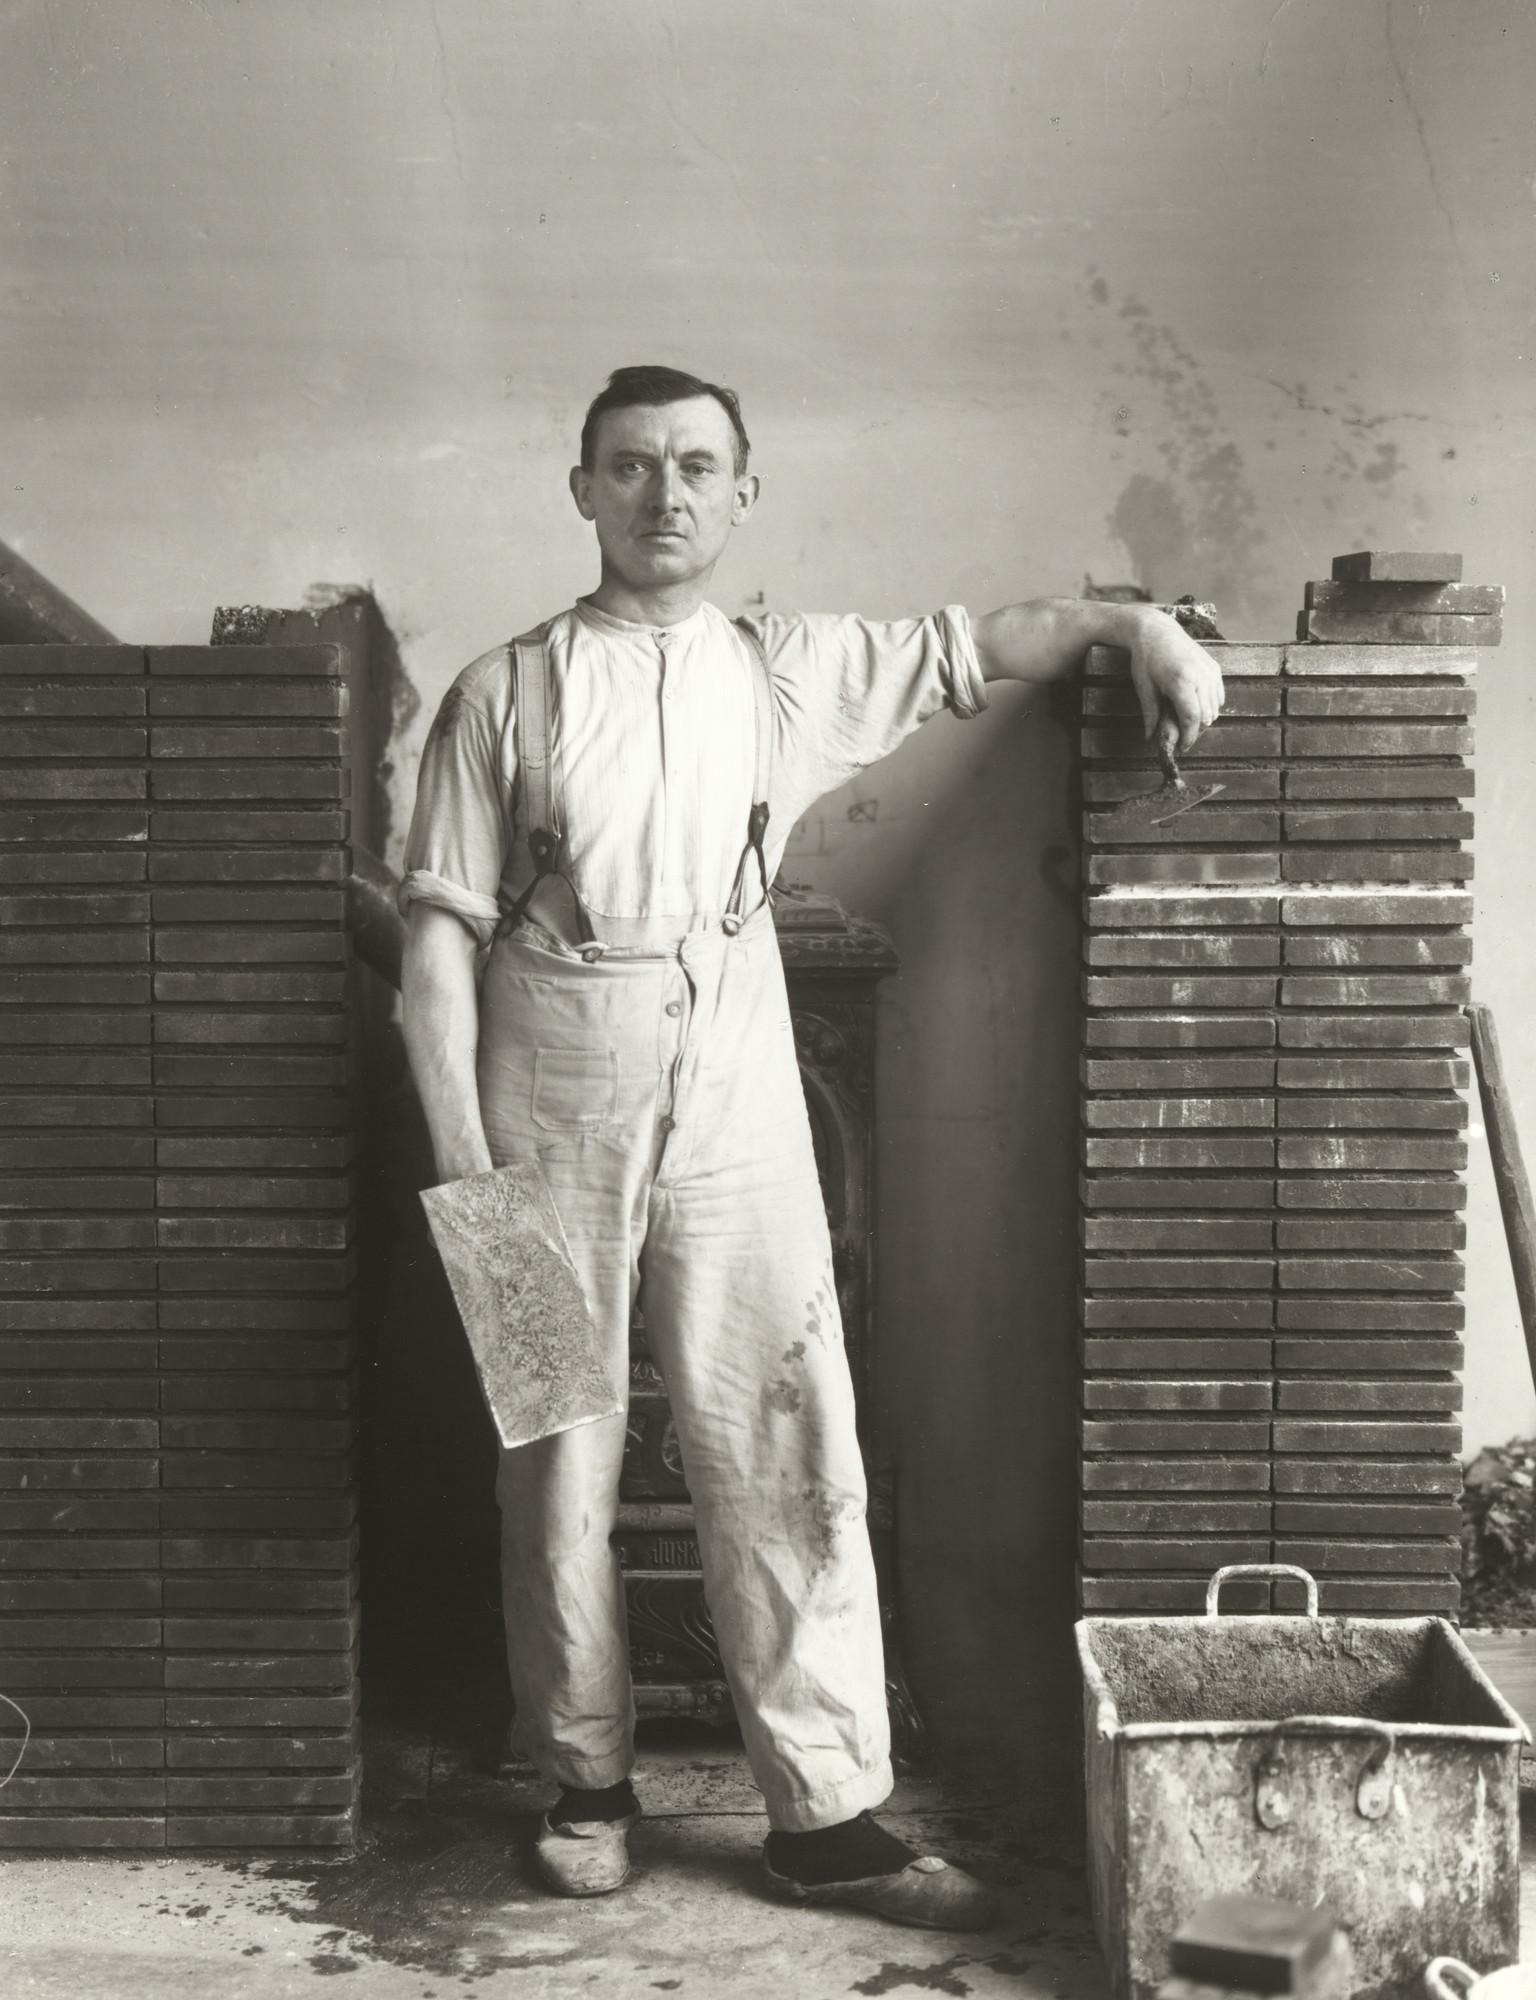 August Sander. Master Mason. 1926 | MoMA